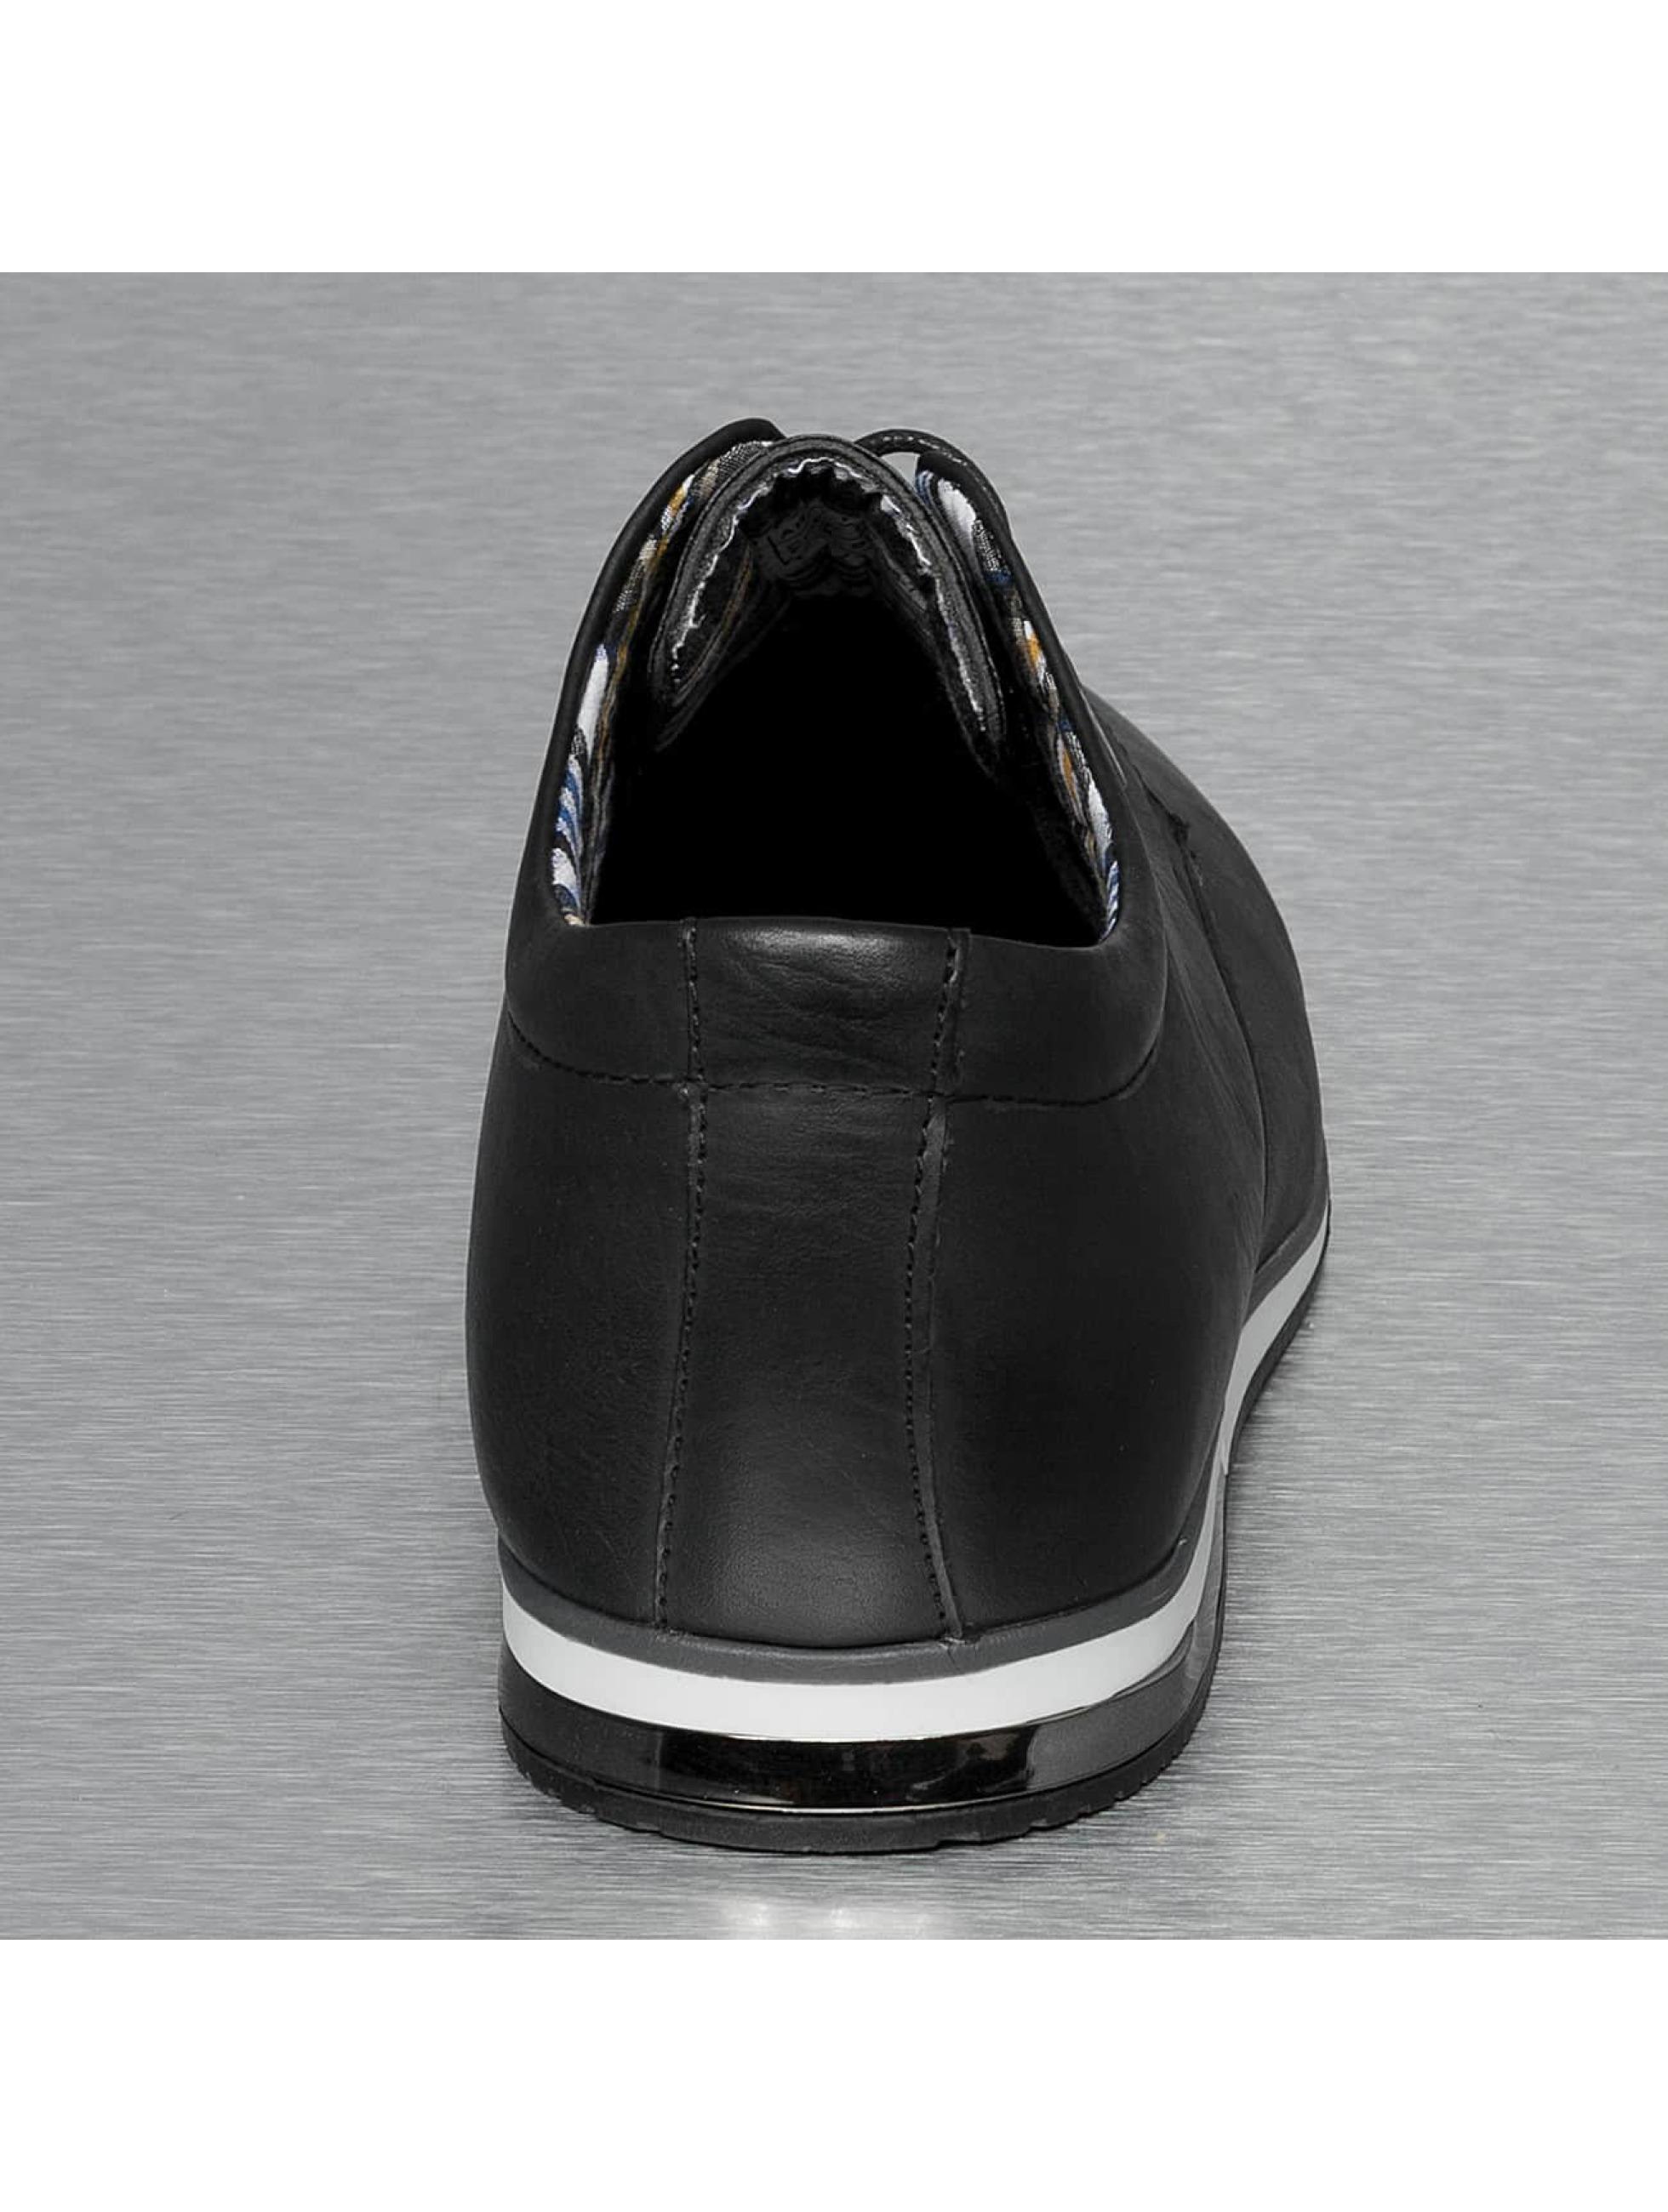 New York Style Sneakers Galway black